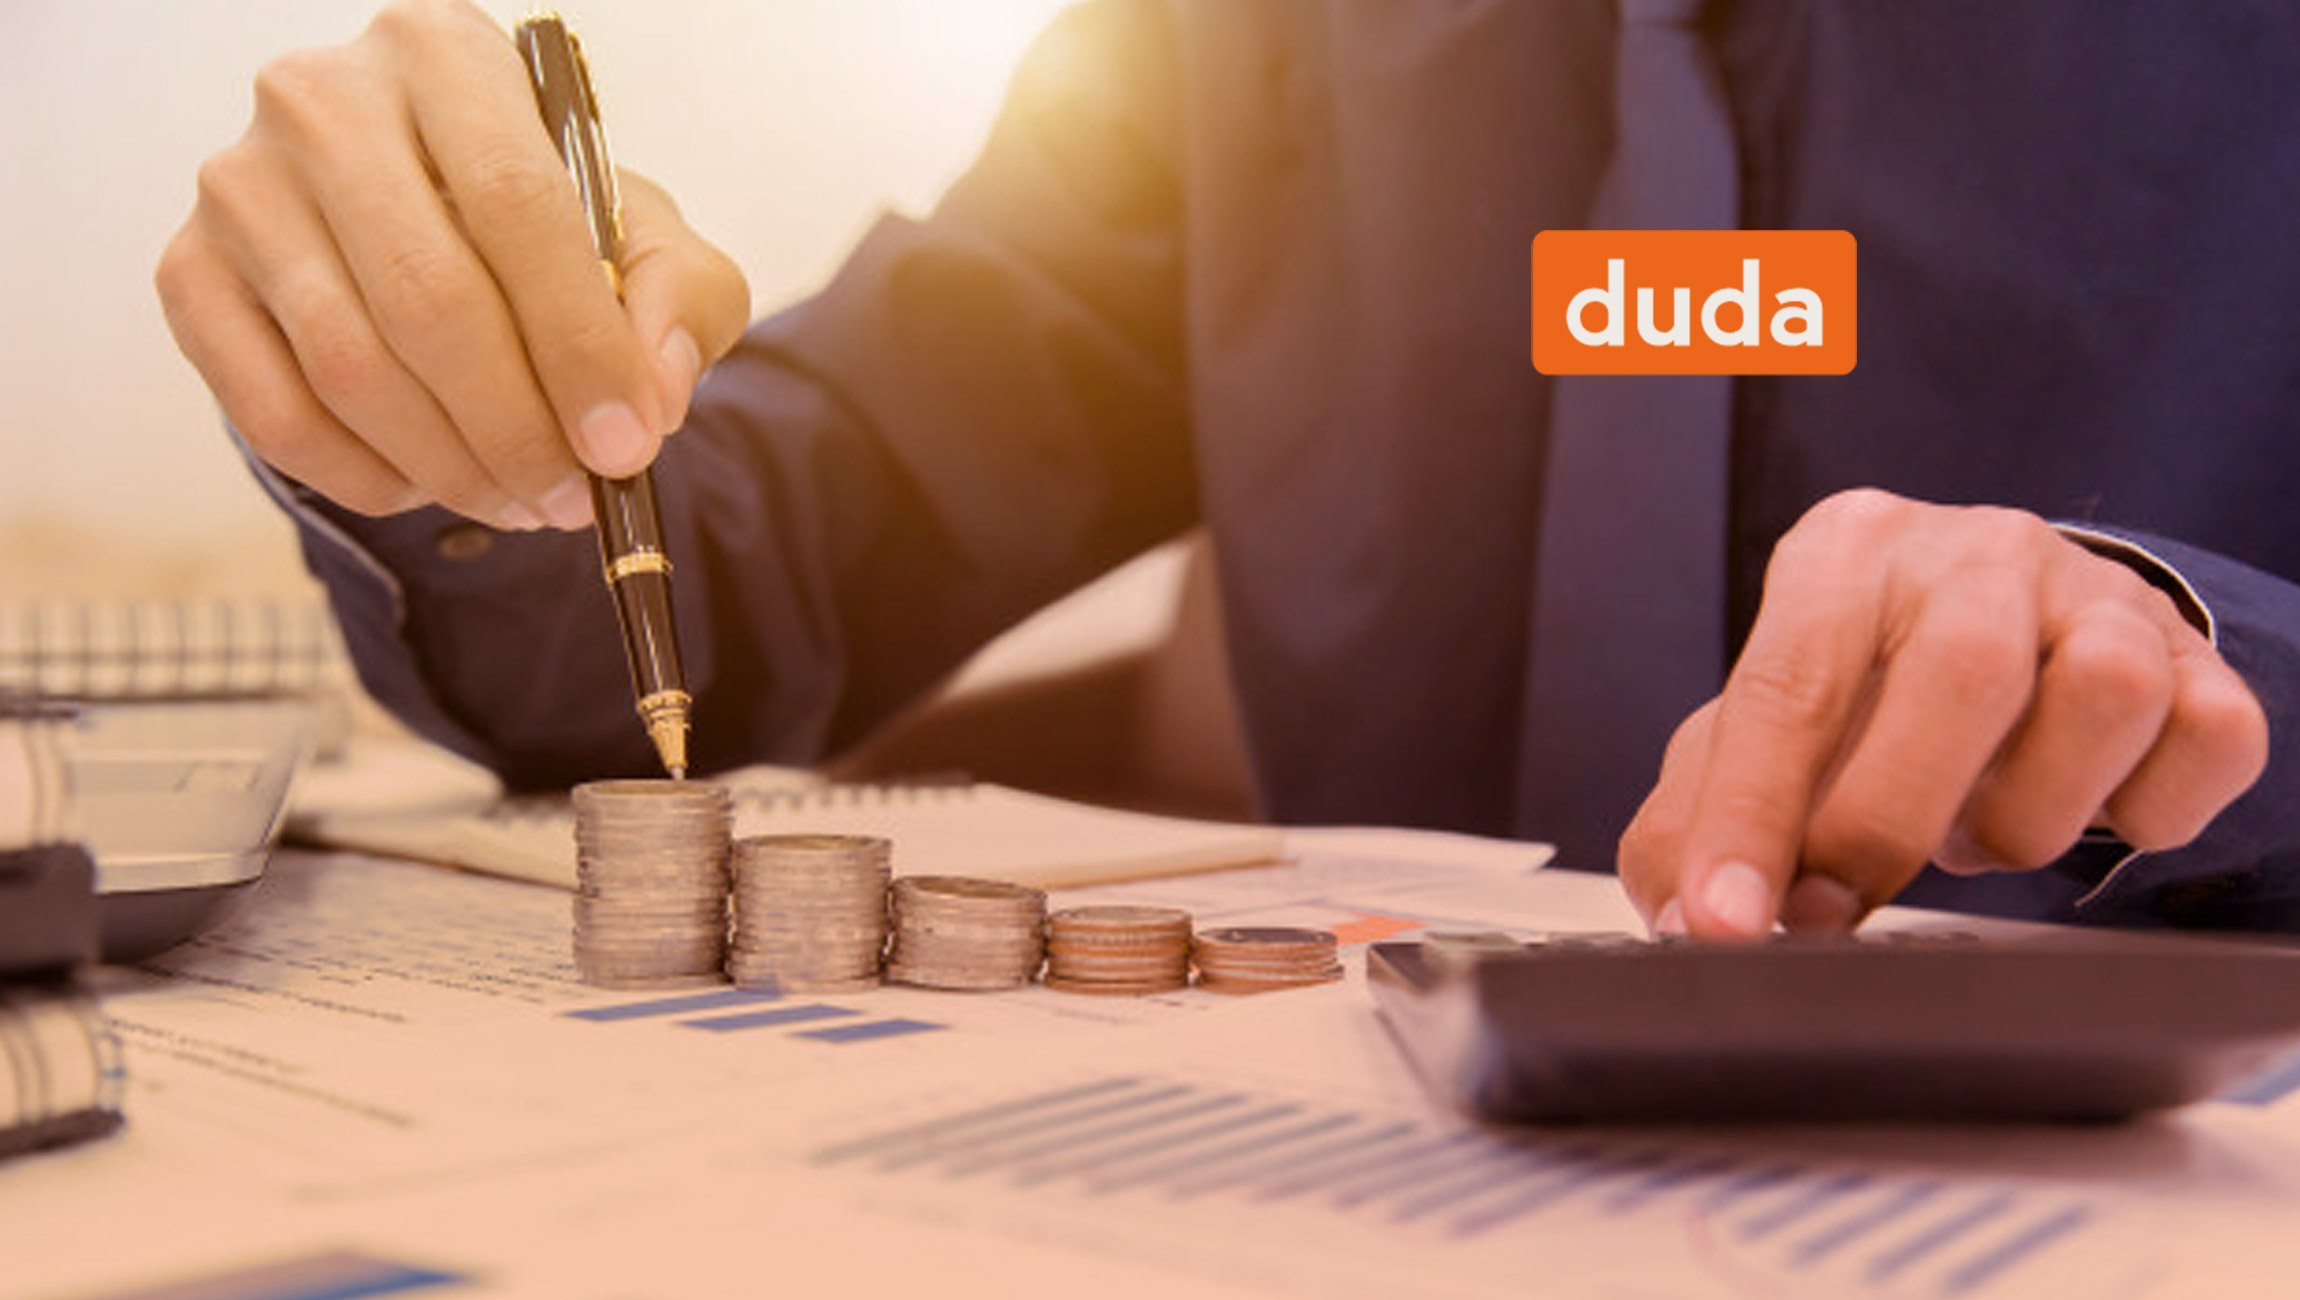 Duda Raises $25m to Provide Website-As-A-Service To Digital Agencies and SAAS Platforms